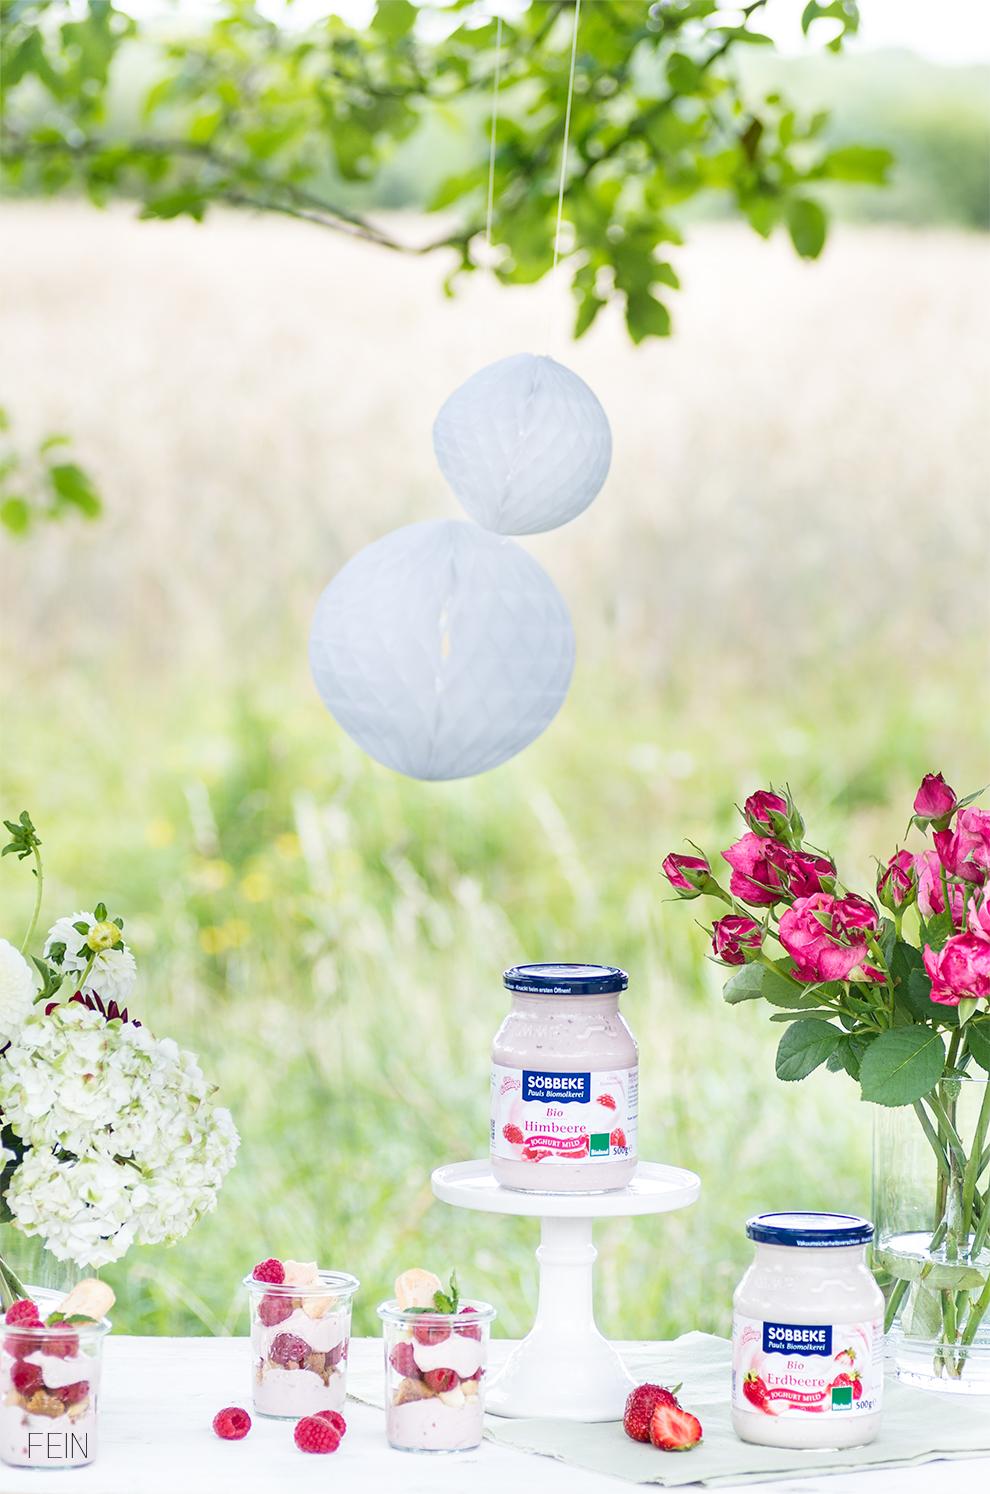 Joghurt Bio Molkerei Söbbeke Outdoor Natur